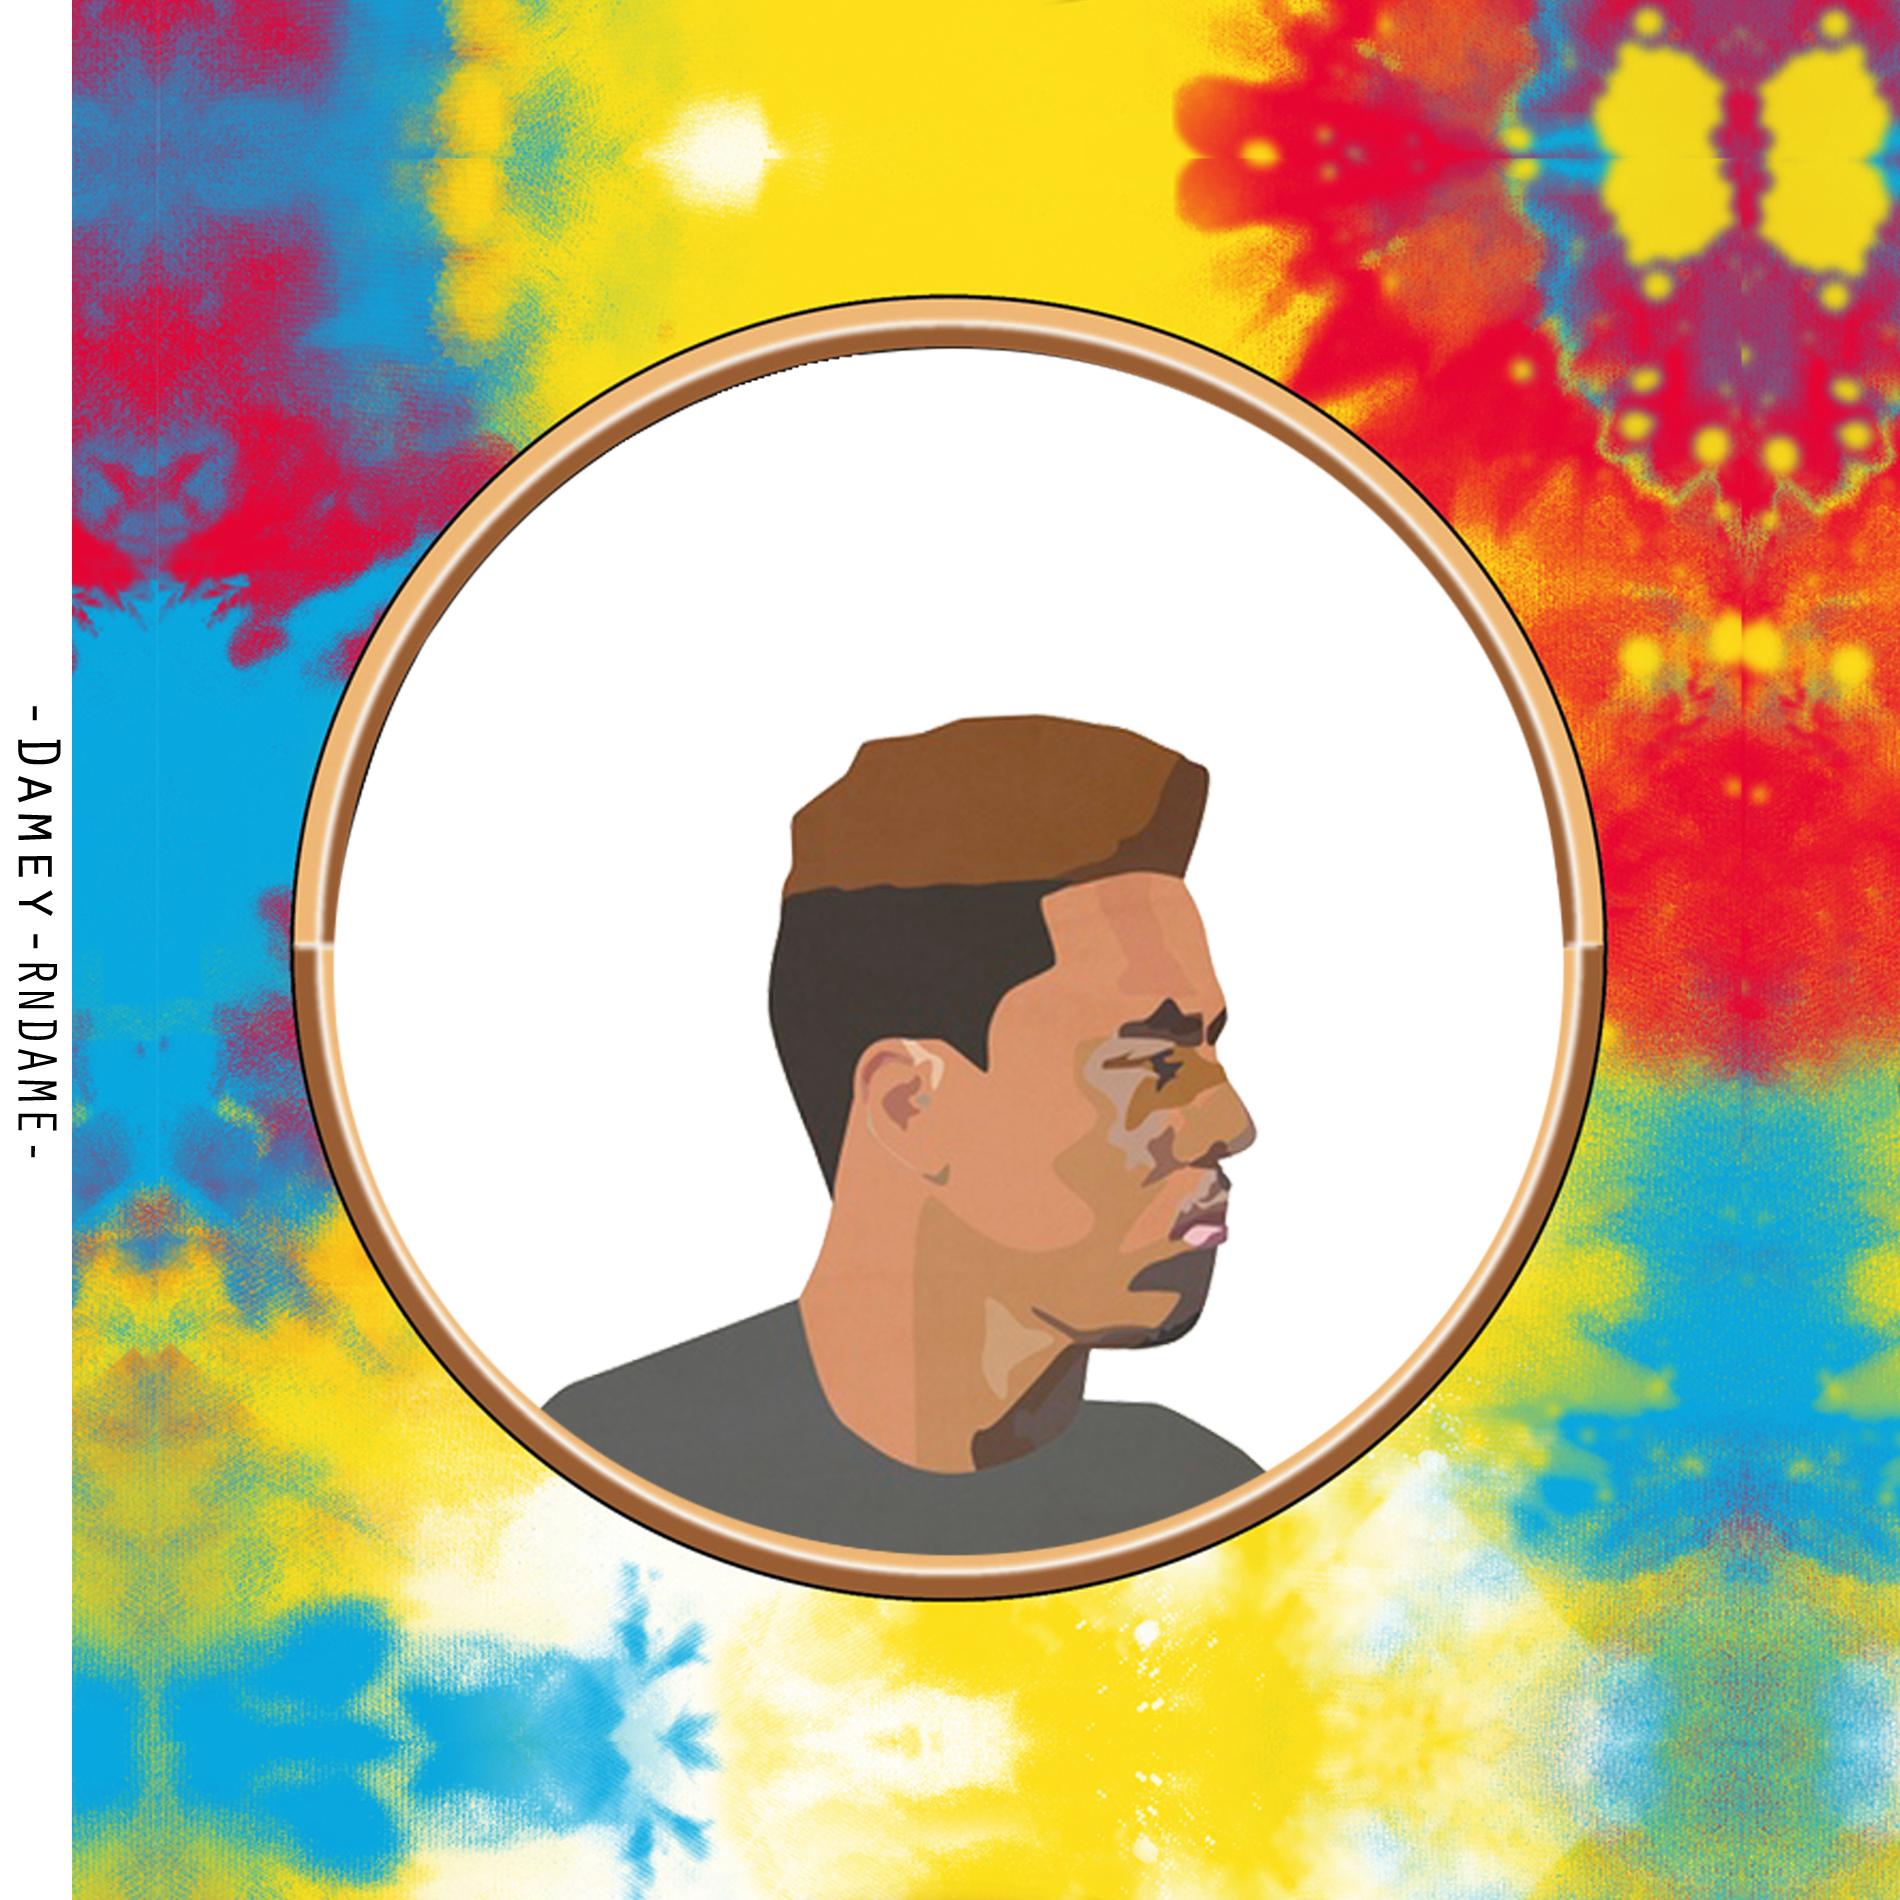 Damey - Ain't Gz (prod. YPOnTheBeat) [Thizzler.com Exclusive]